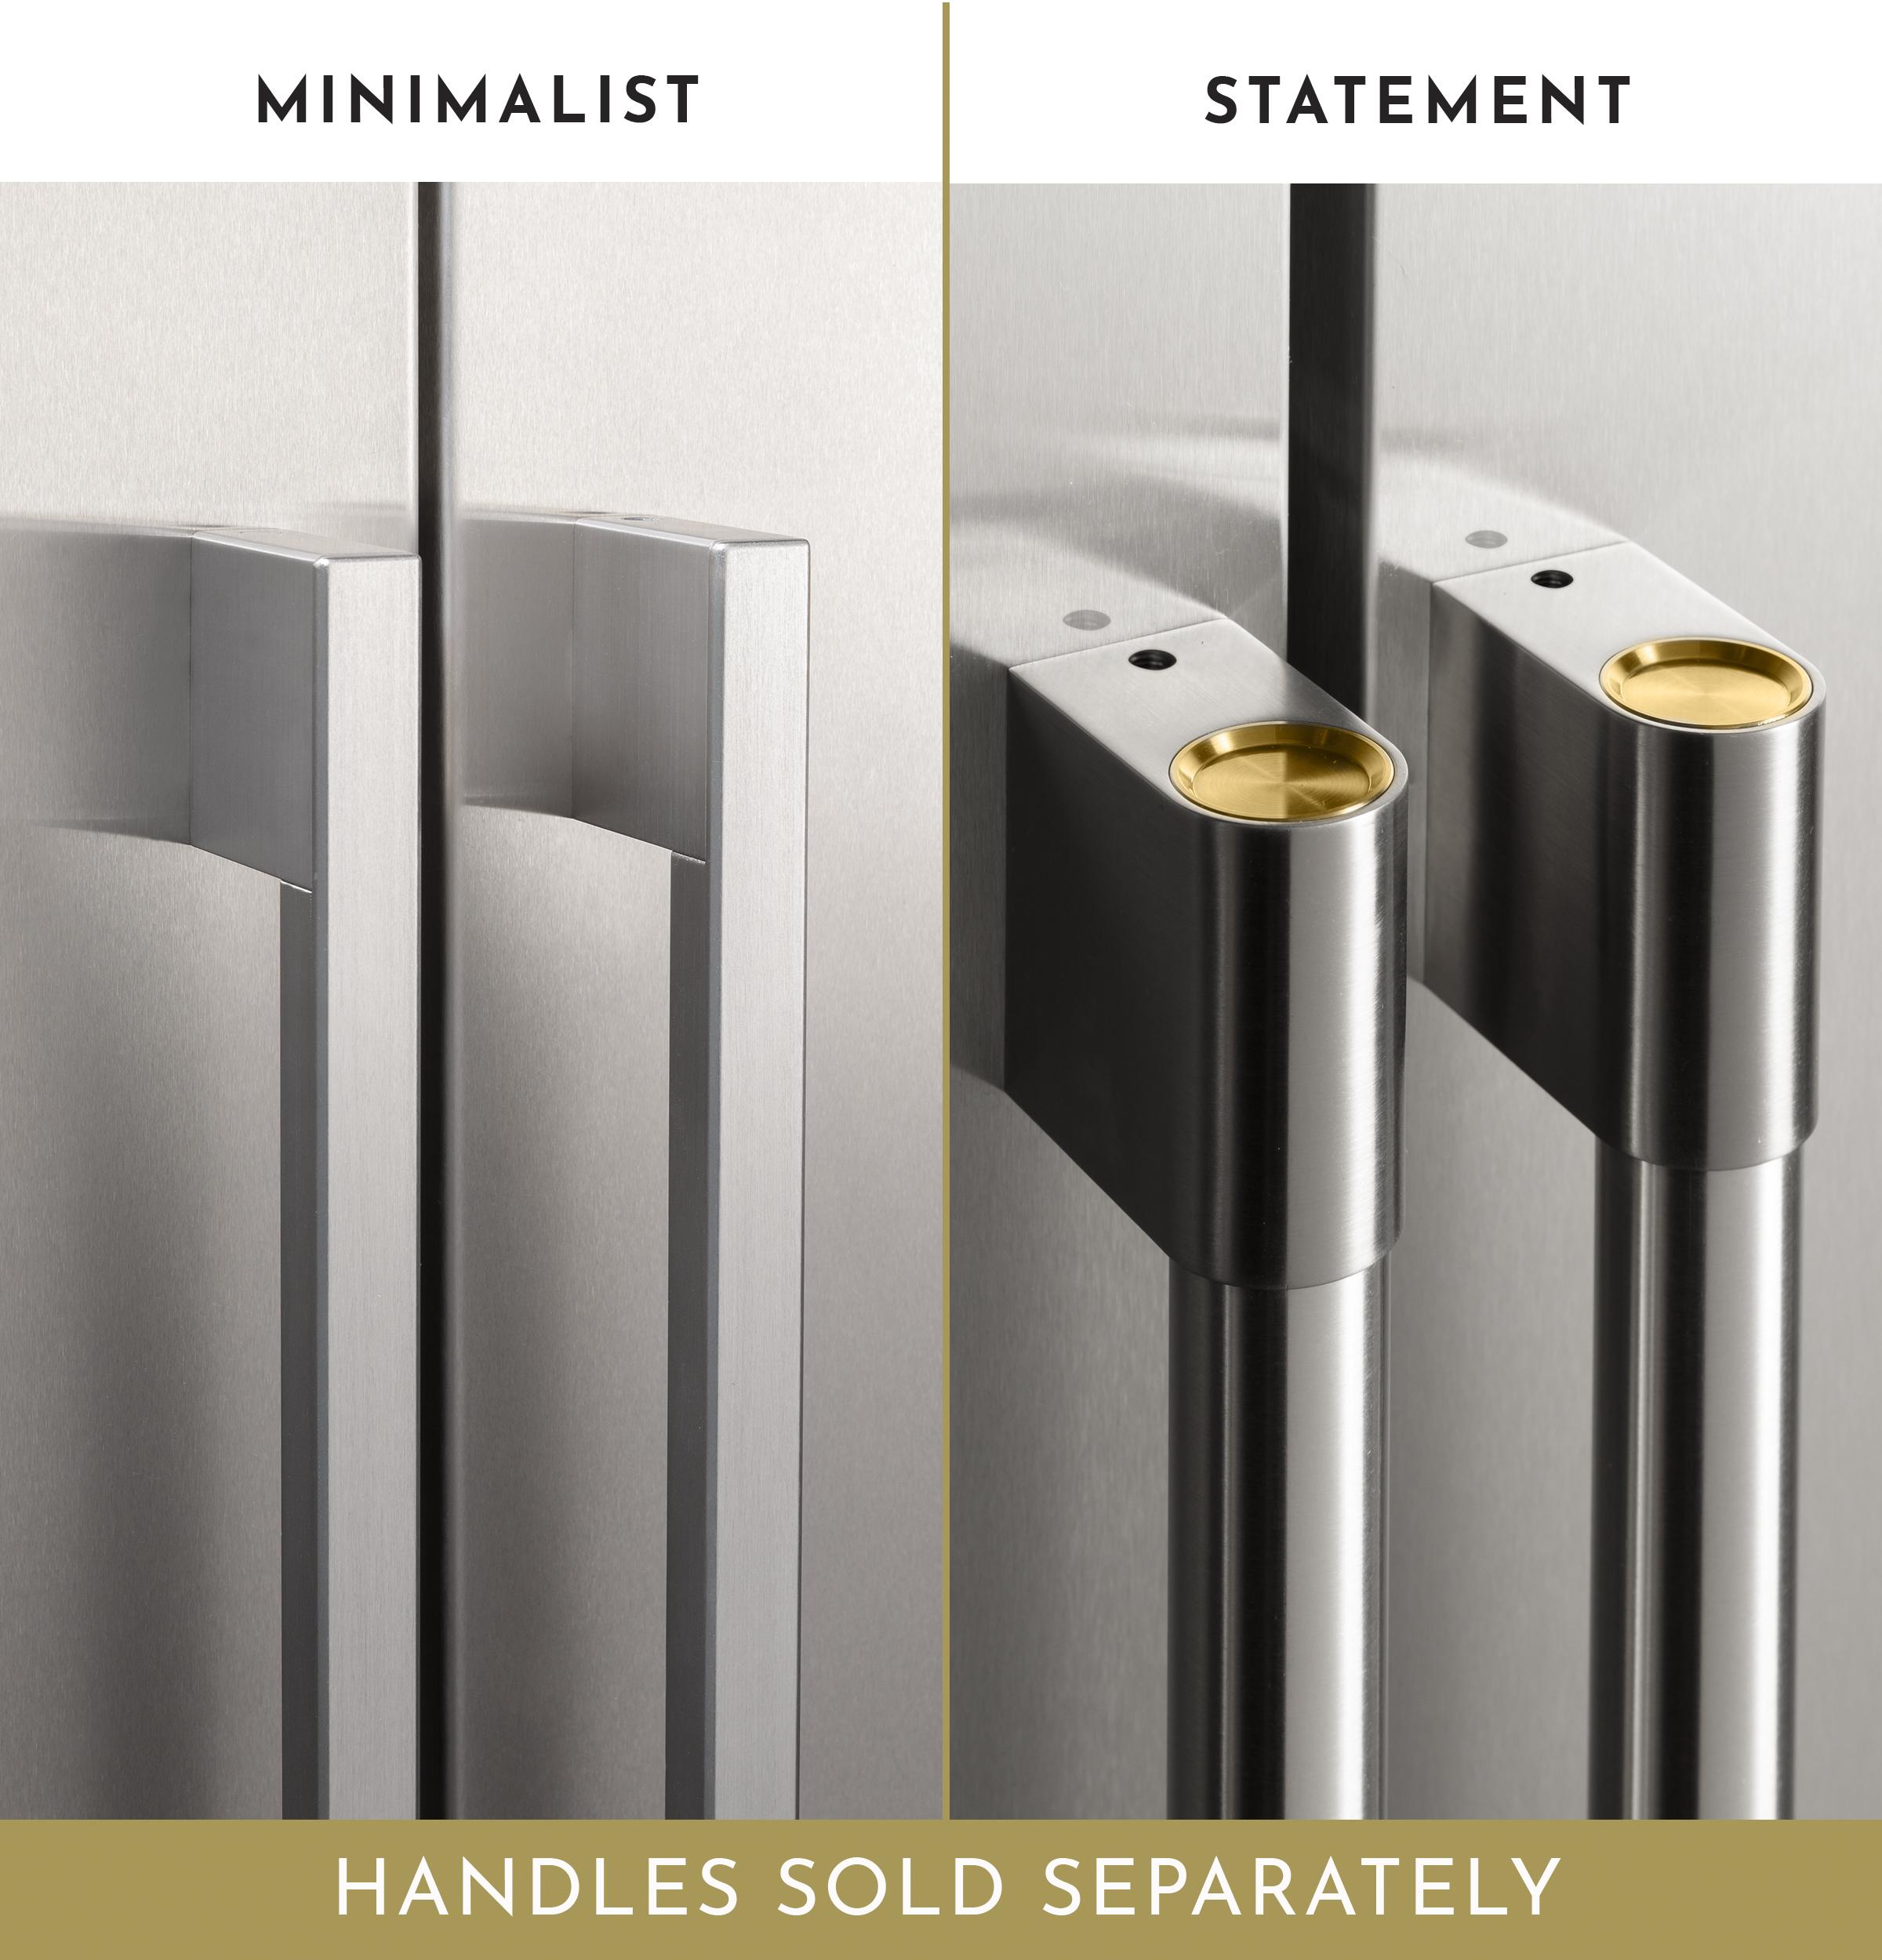 "Model: ZISS480DNSS | Monogram Monogram 48"" Smart Built-In Side-by-Side Refrigerator with Dispenser"